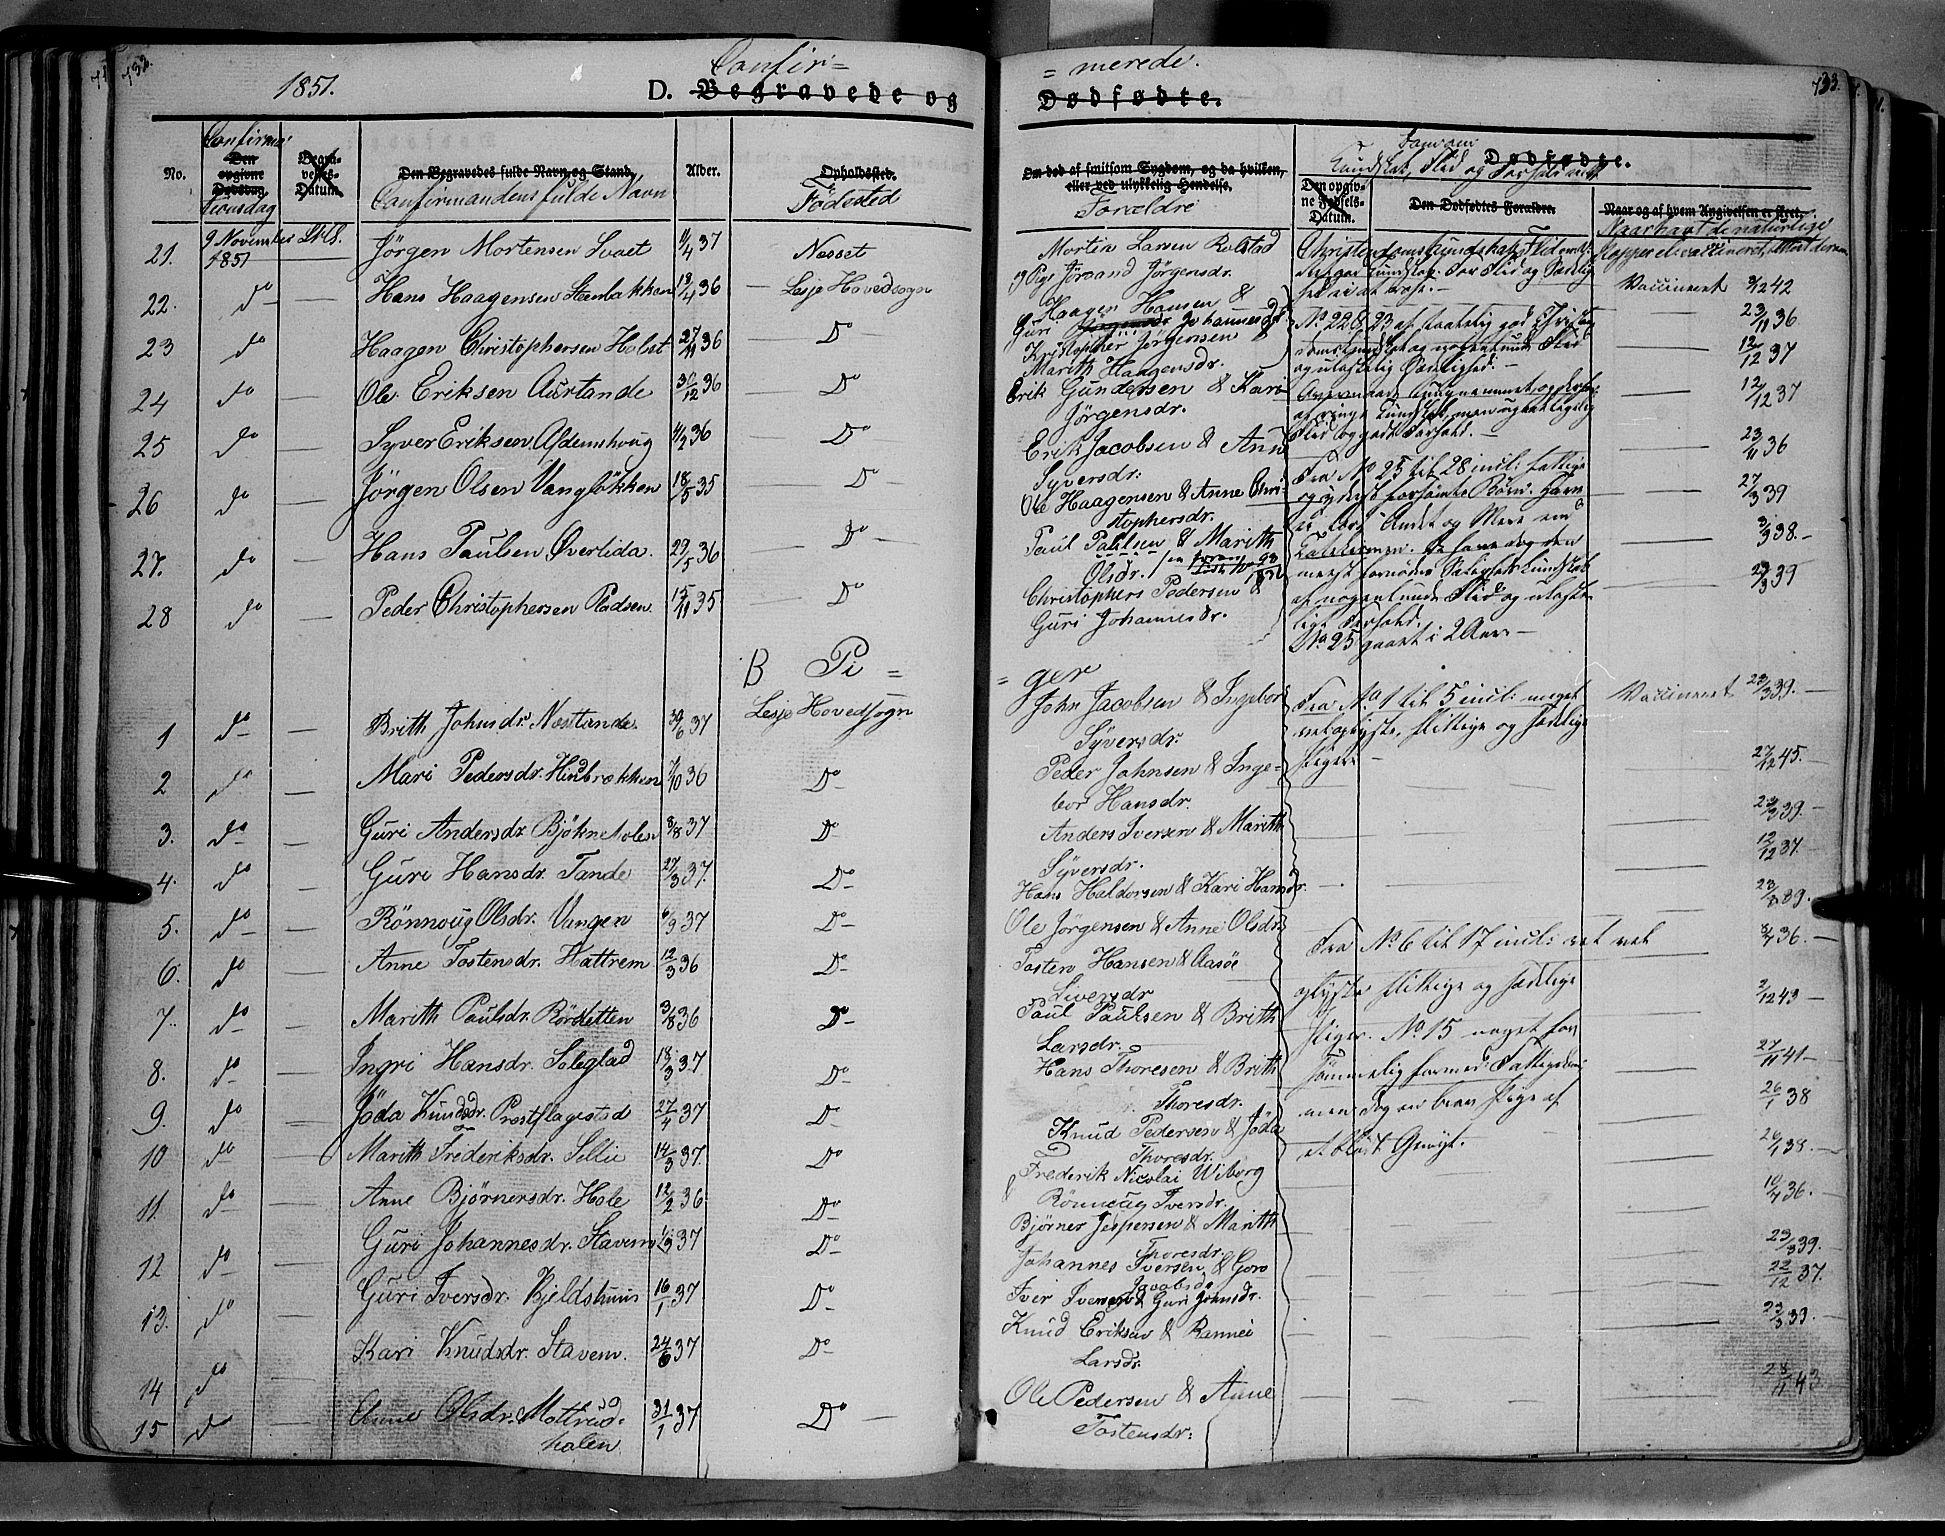 SAH, Lesja prestekontor, Ministerialbok nr. 6B, 1843-1854, s. 732-733